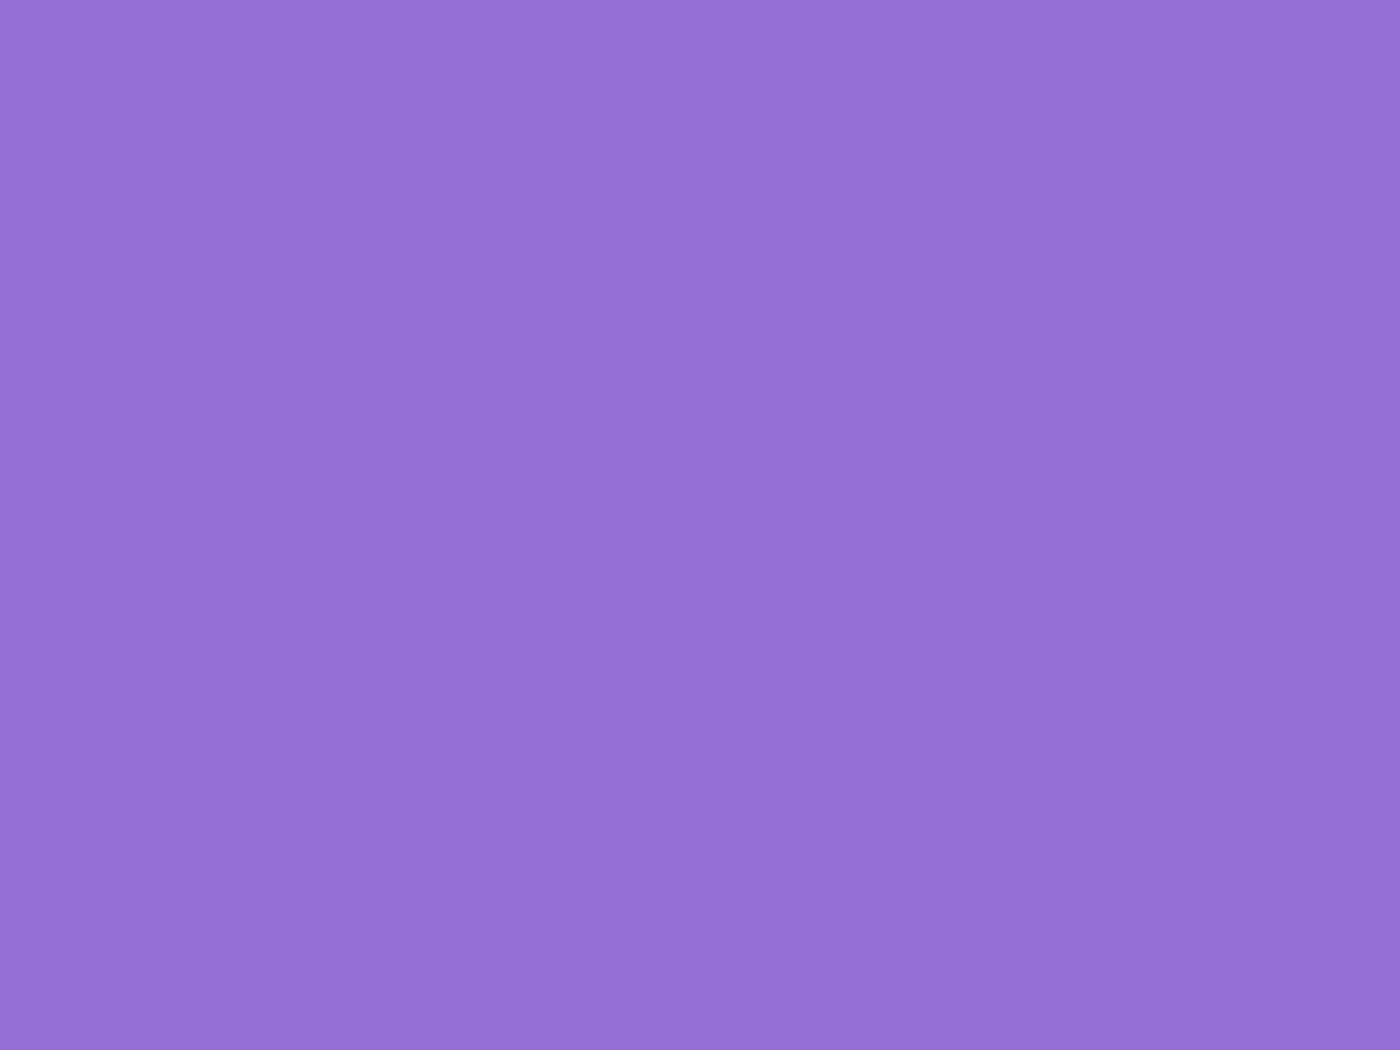 1400x1050 resolution Dark Pastel Purple solid color background 1400x1050